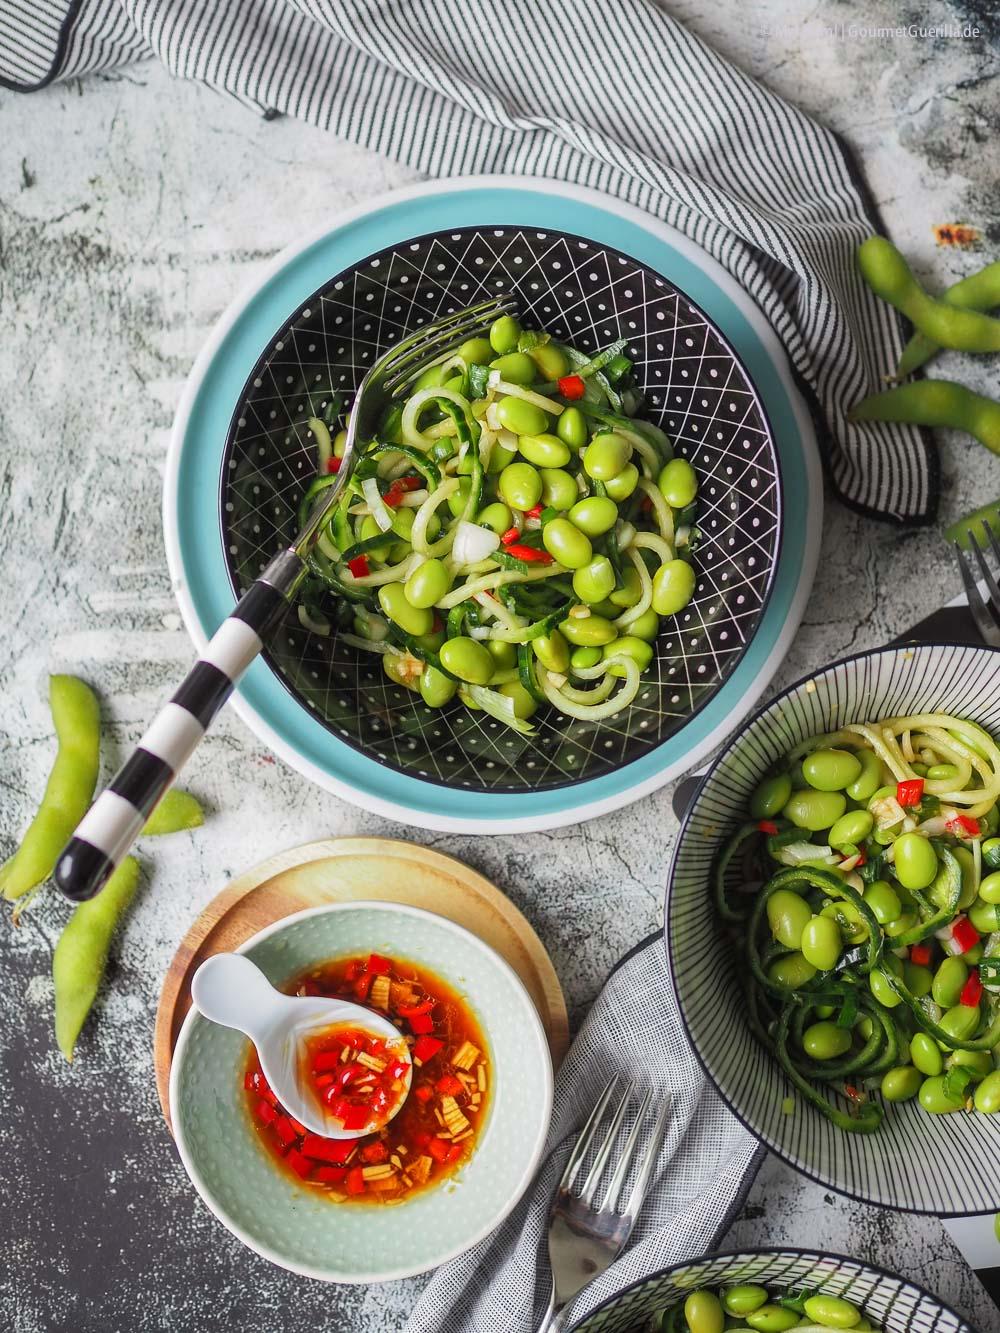 Daves veganer Edamame-Gurken-Salat |GourmetGuerilla.de